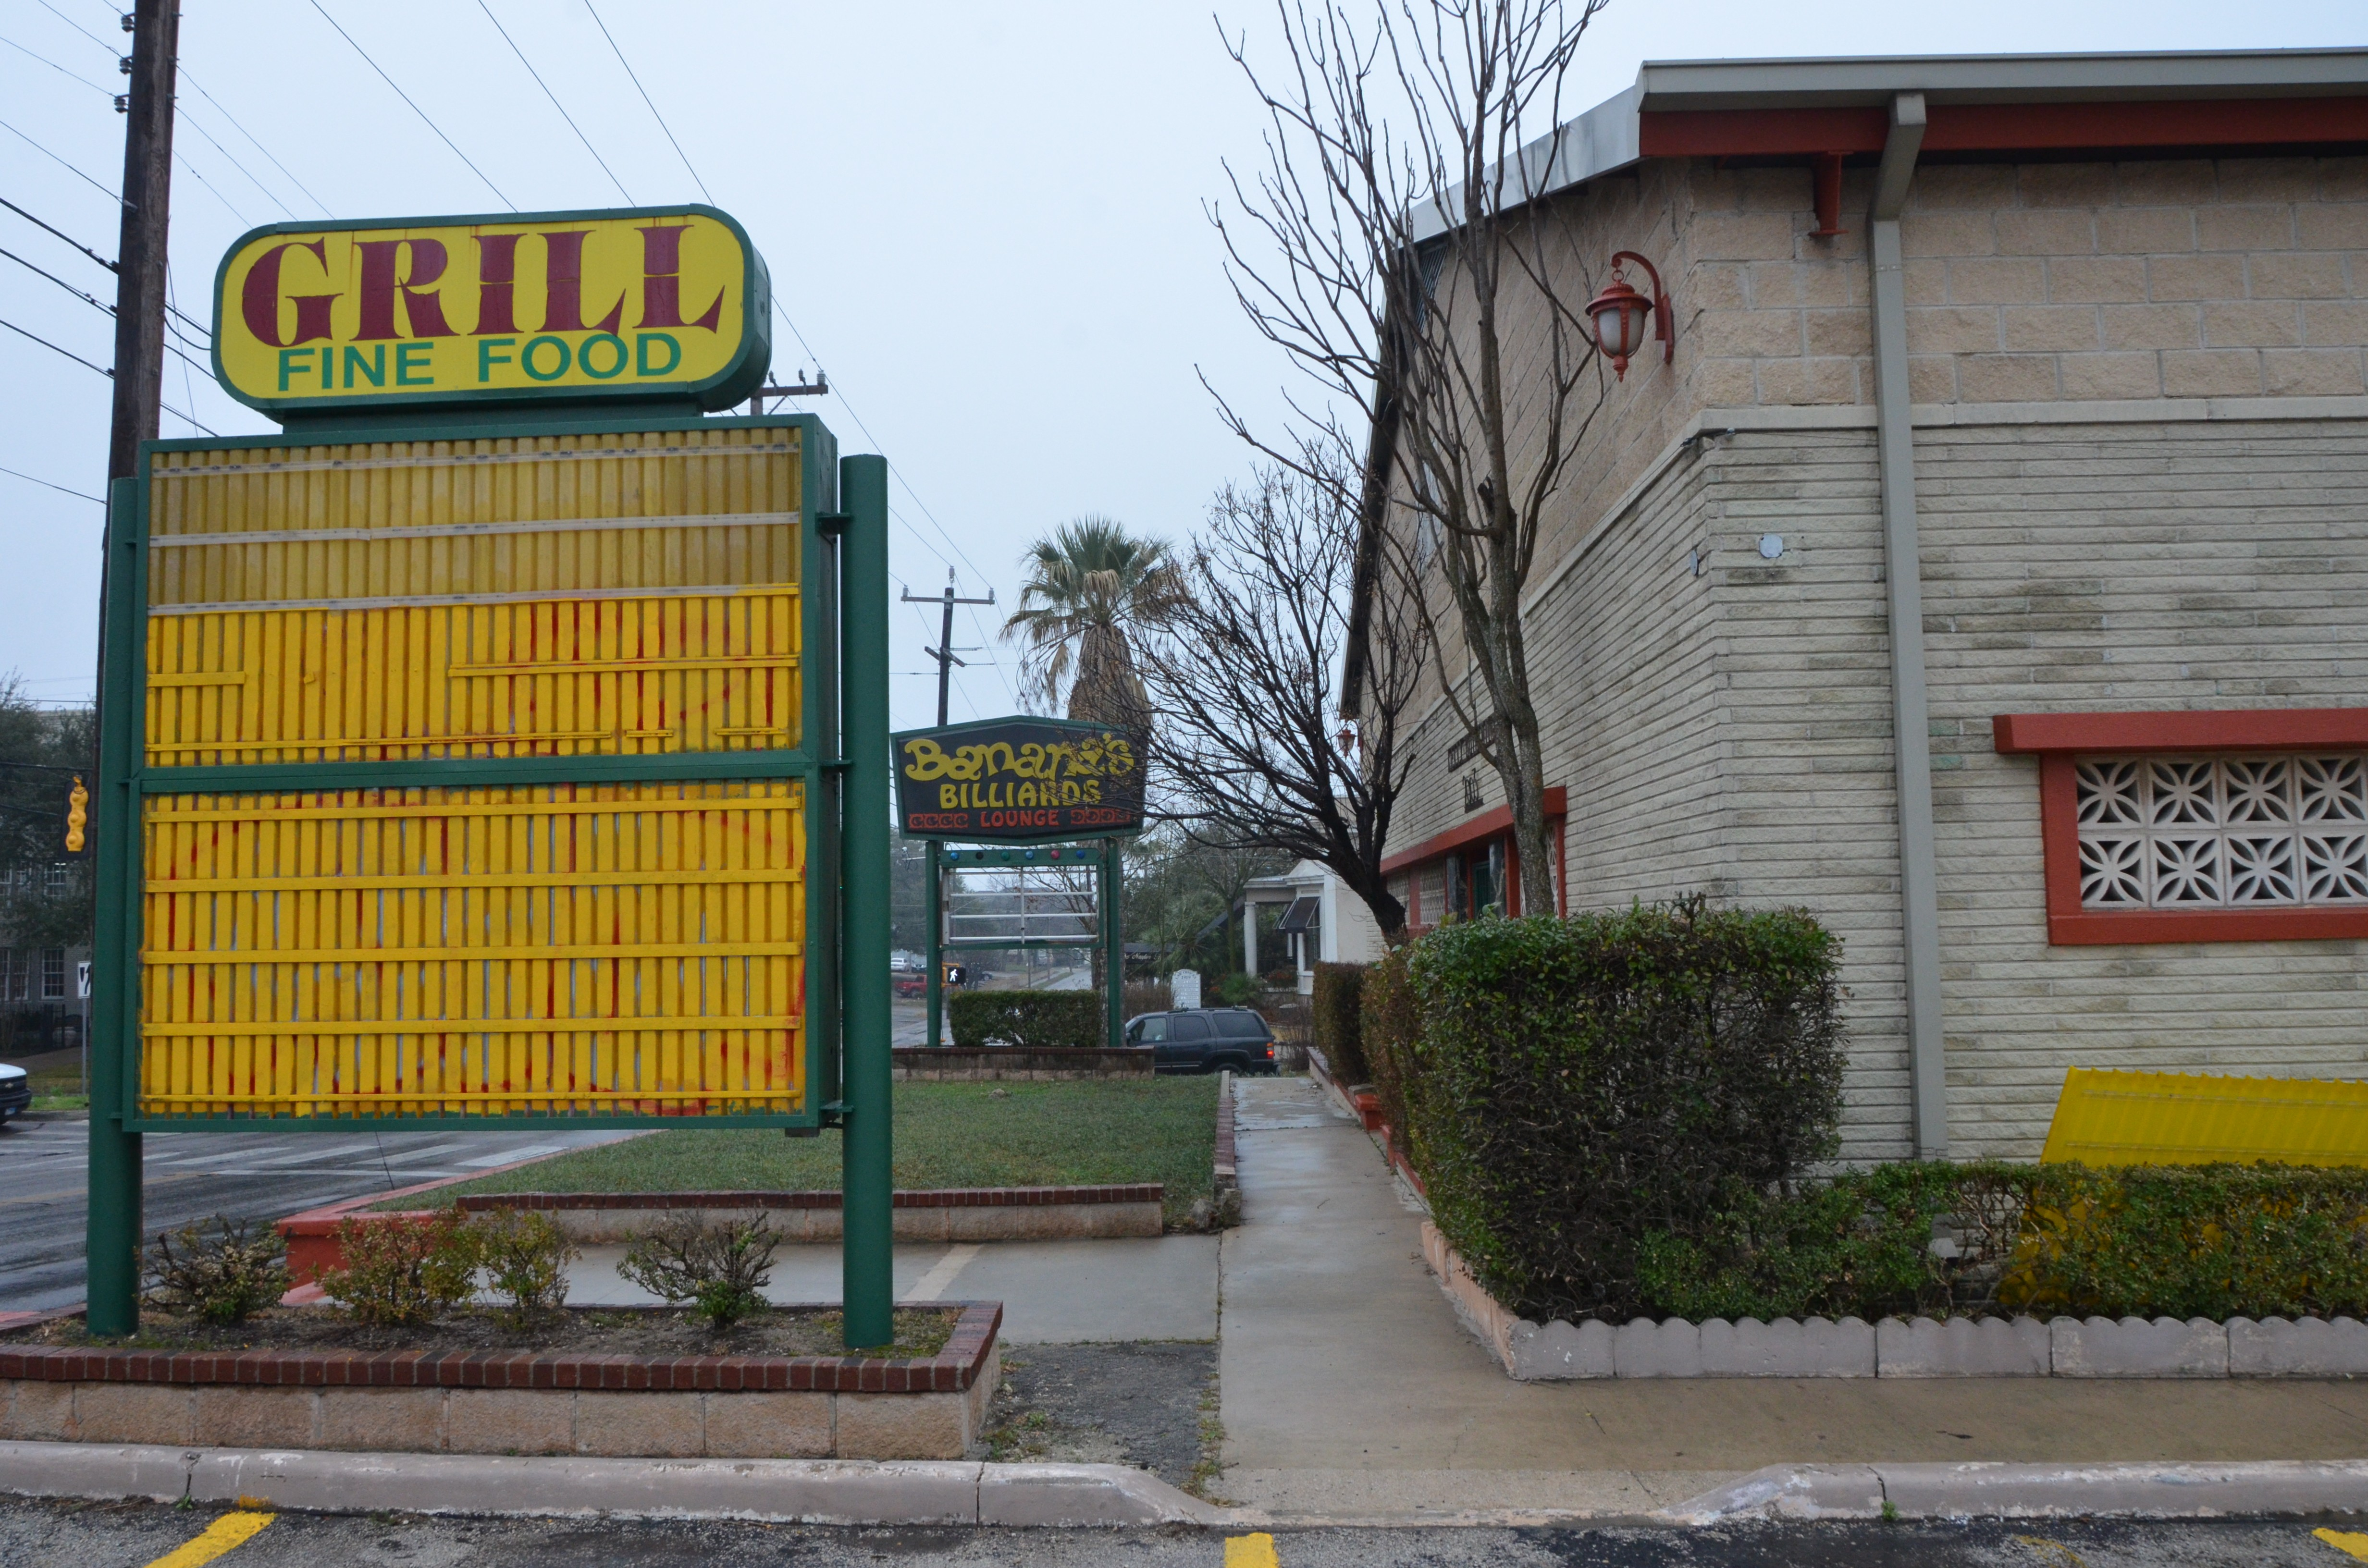 Beloved Pool Hall Banana S Billiards Will Reopen Thursday